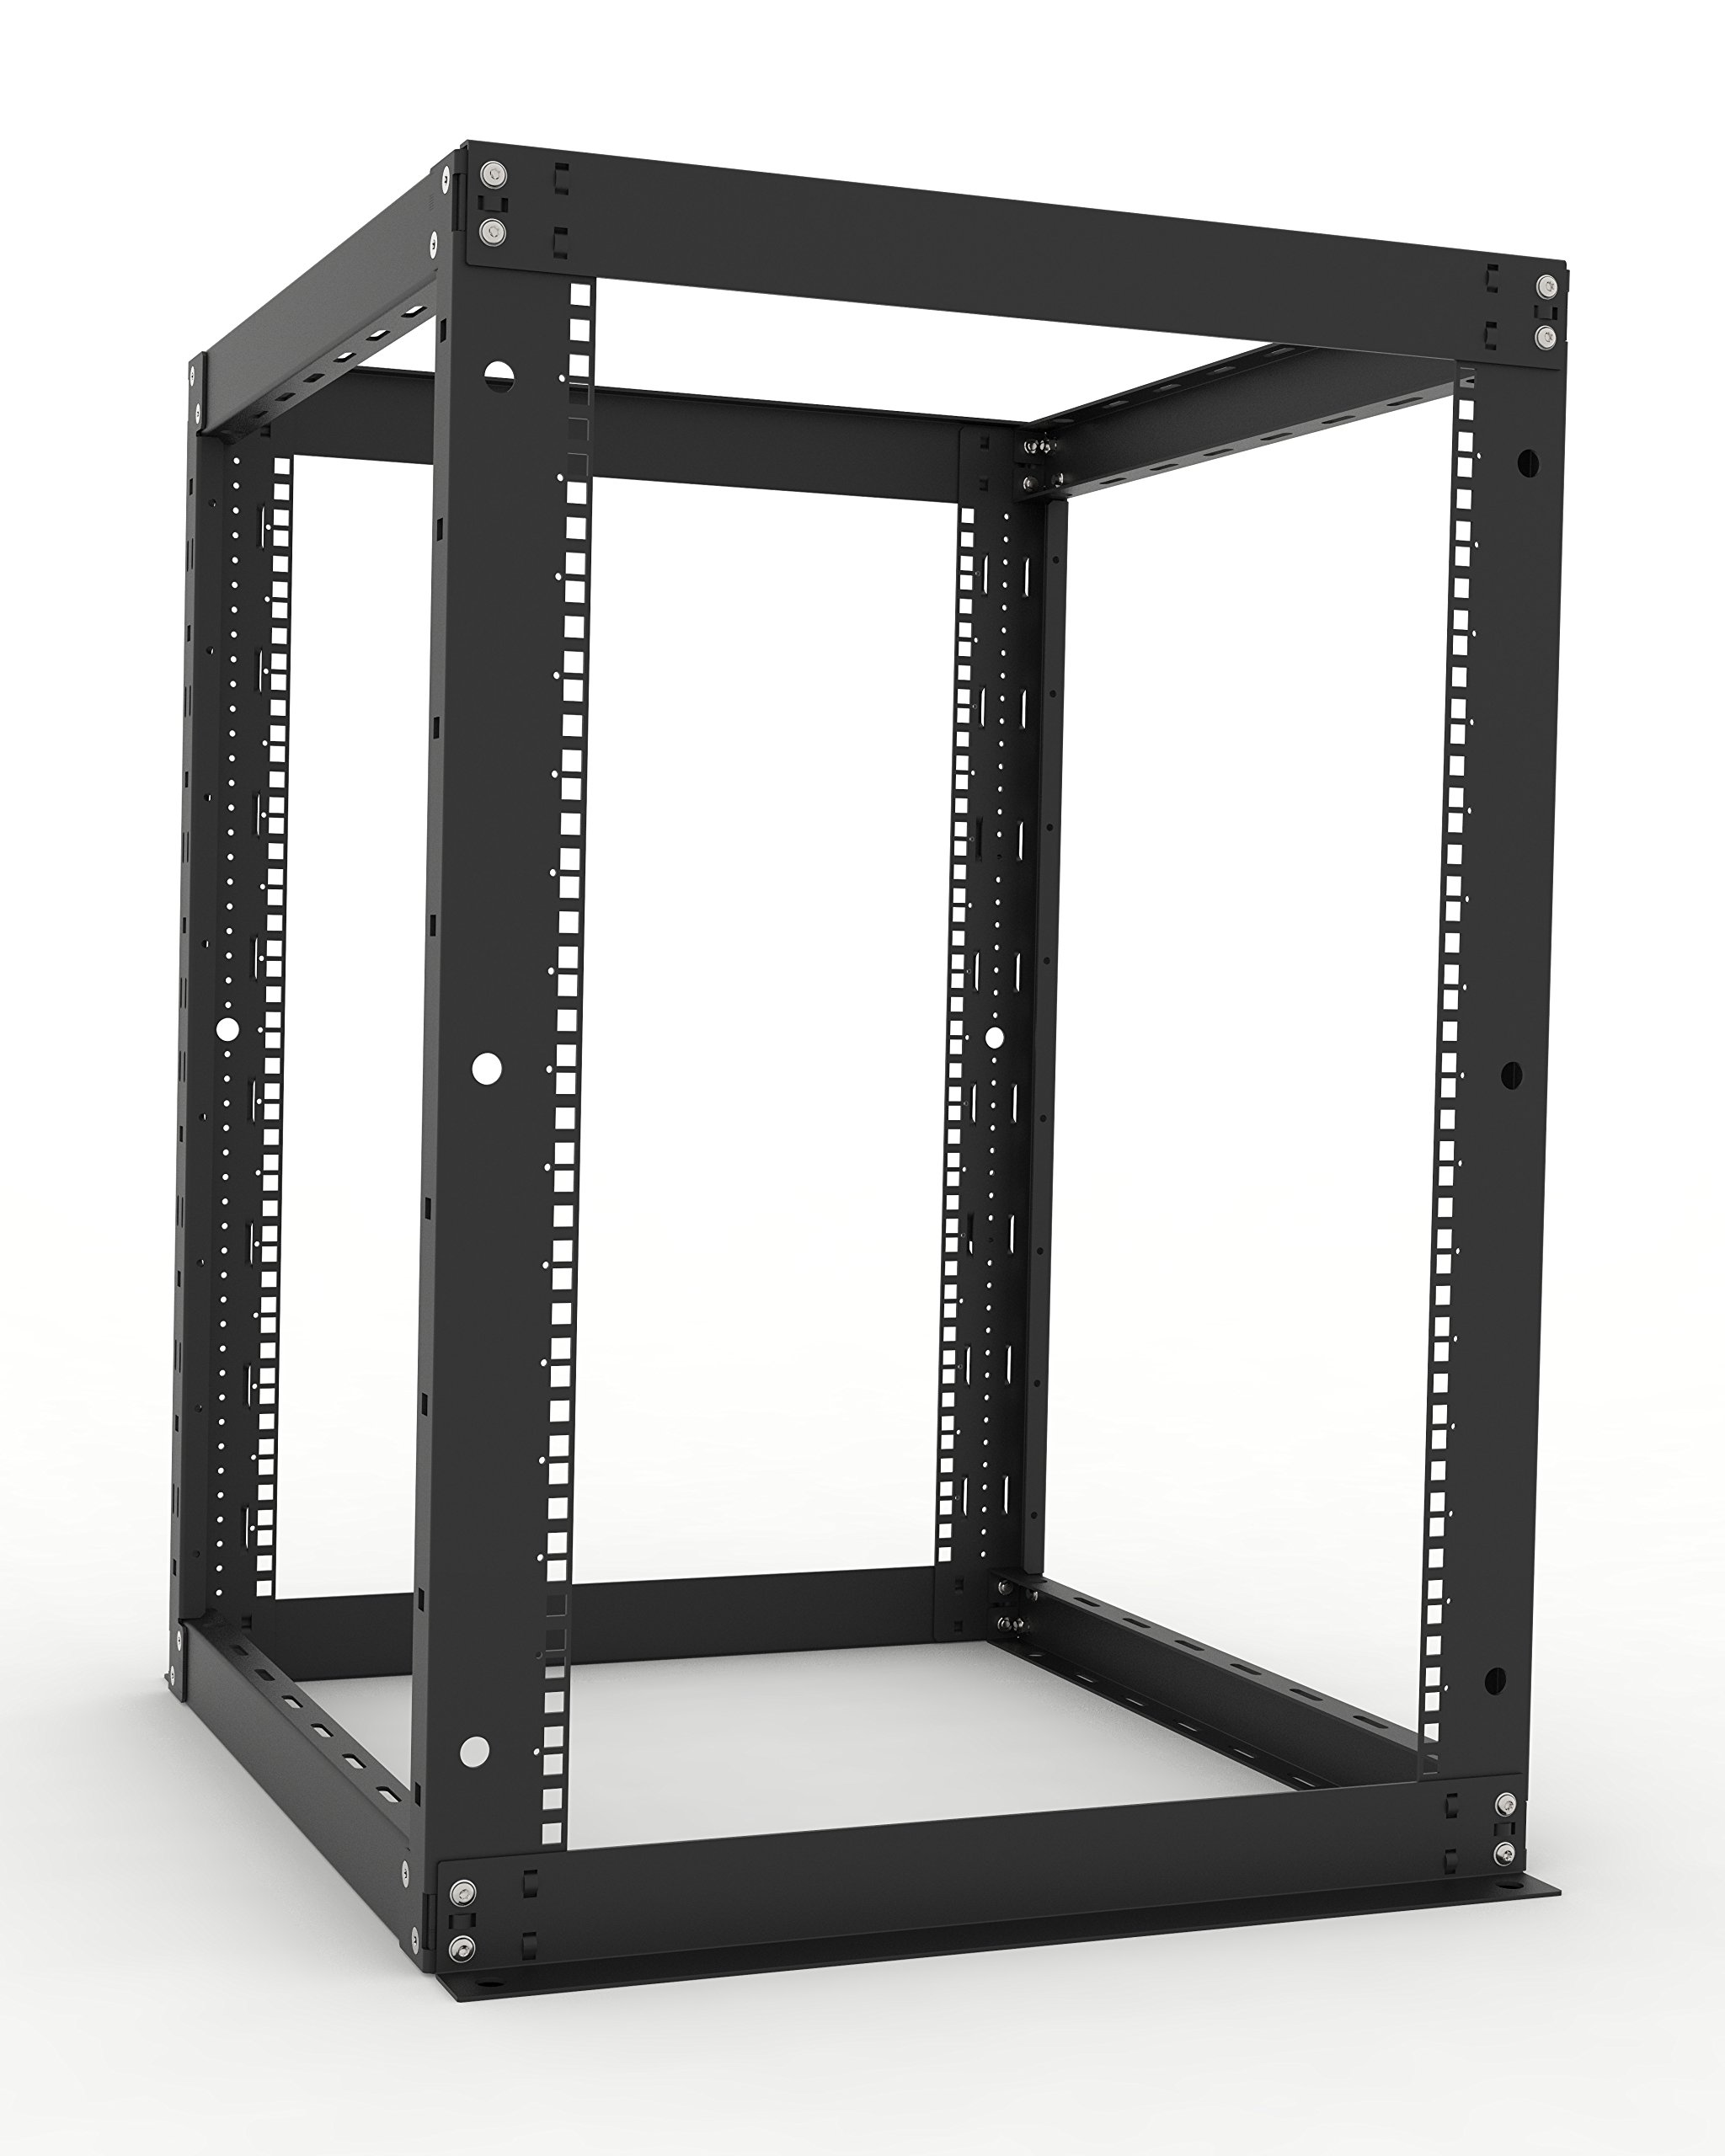 RACKSOLUTIONS Open Frame Rack (29'' Depth, 16U)